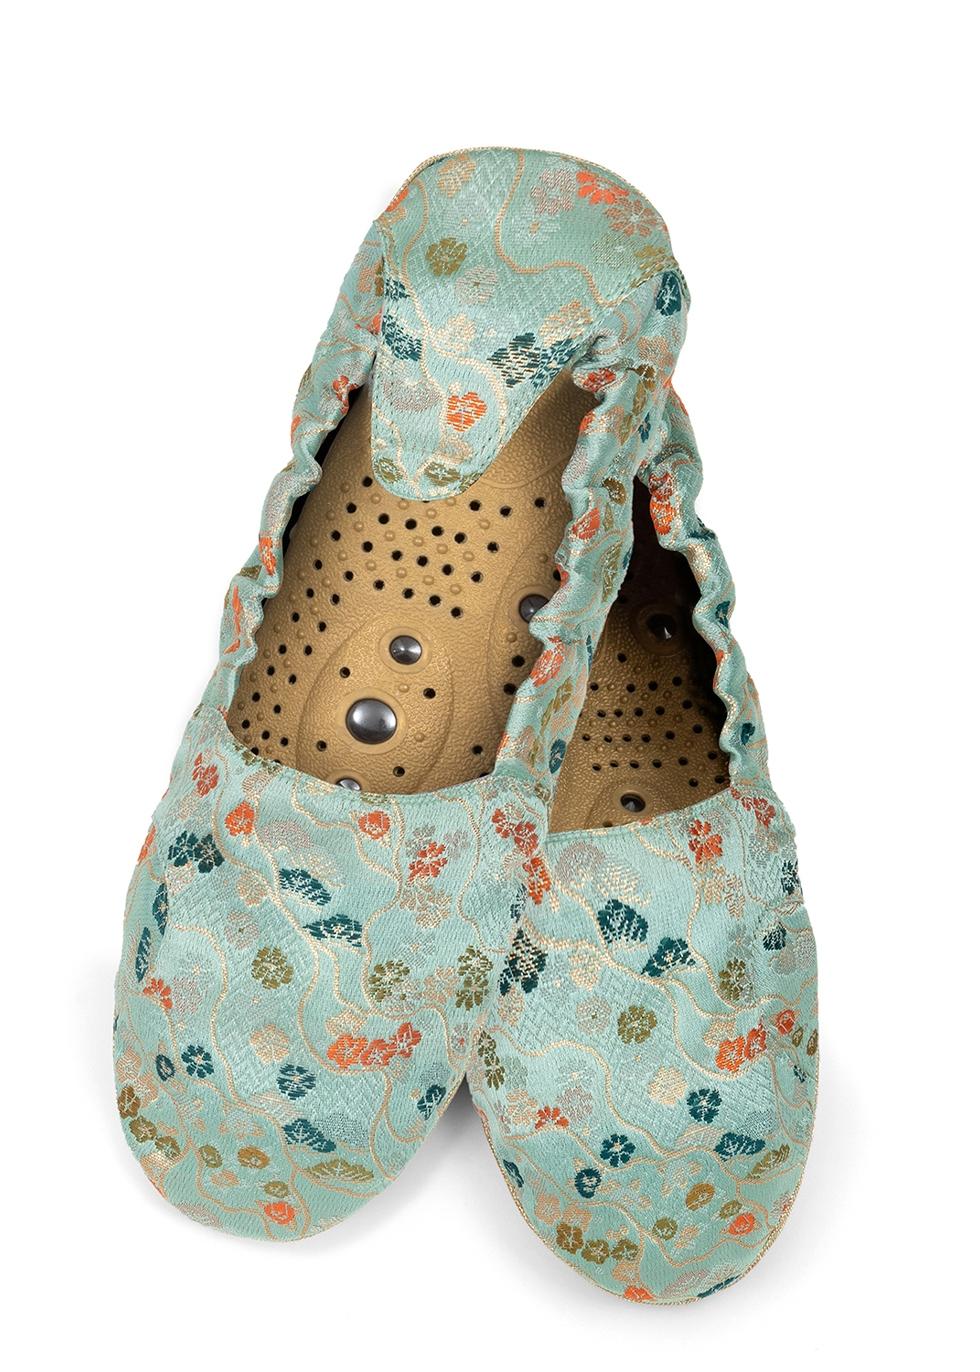 Japanese Jade Slippers - Small